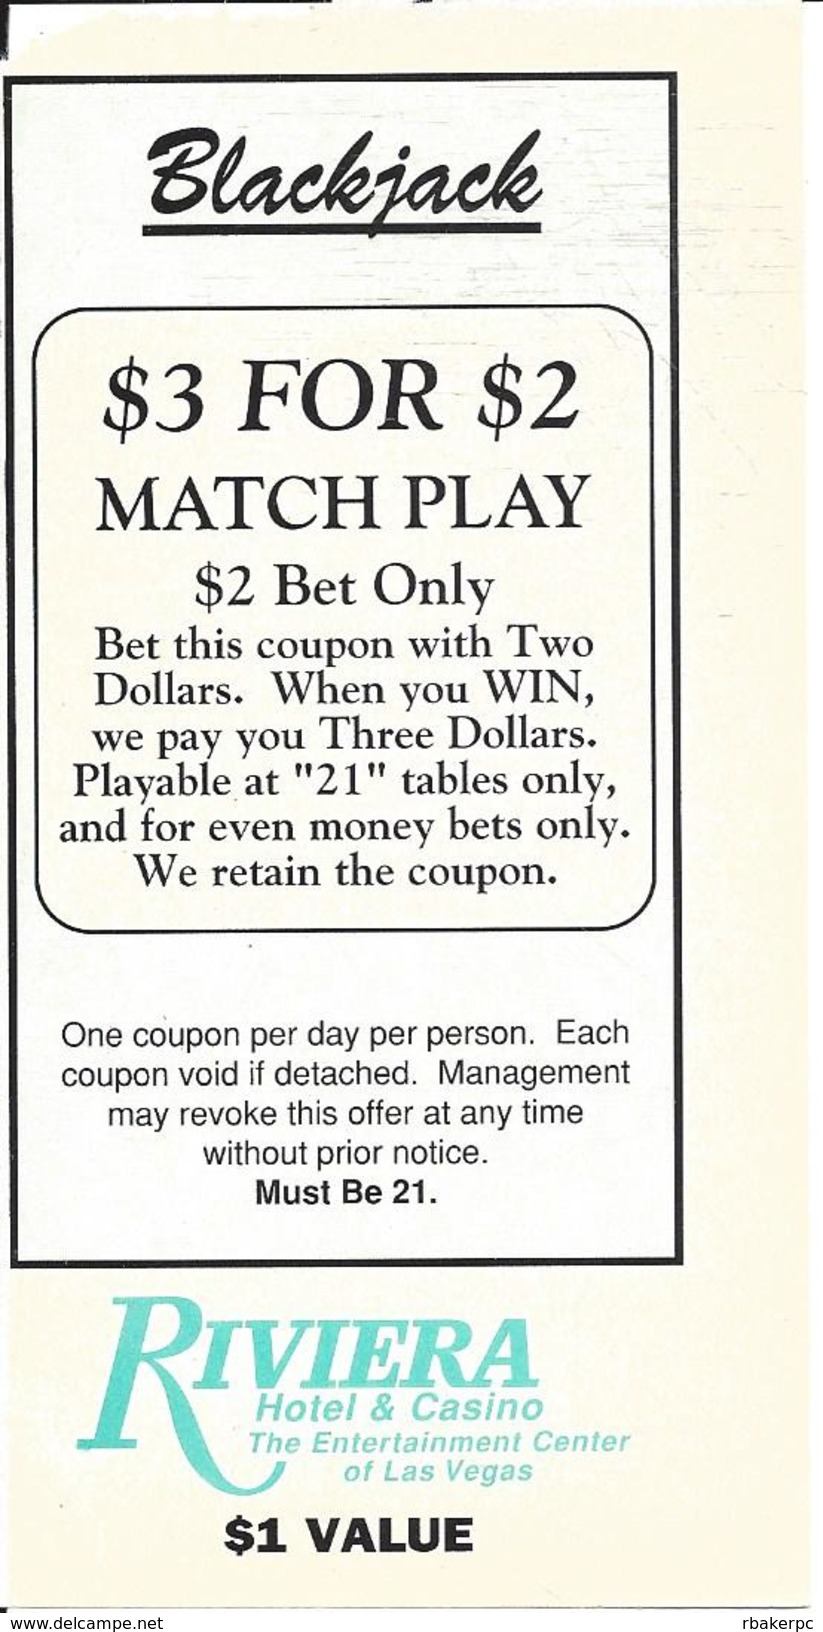 Riviera Casino Las Vegas, NV - Paper Blackjack $3 For $2 Match Play Coupon - Advertising